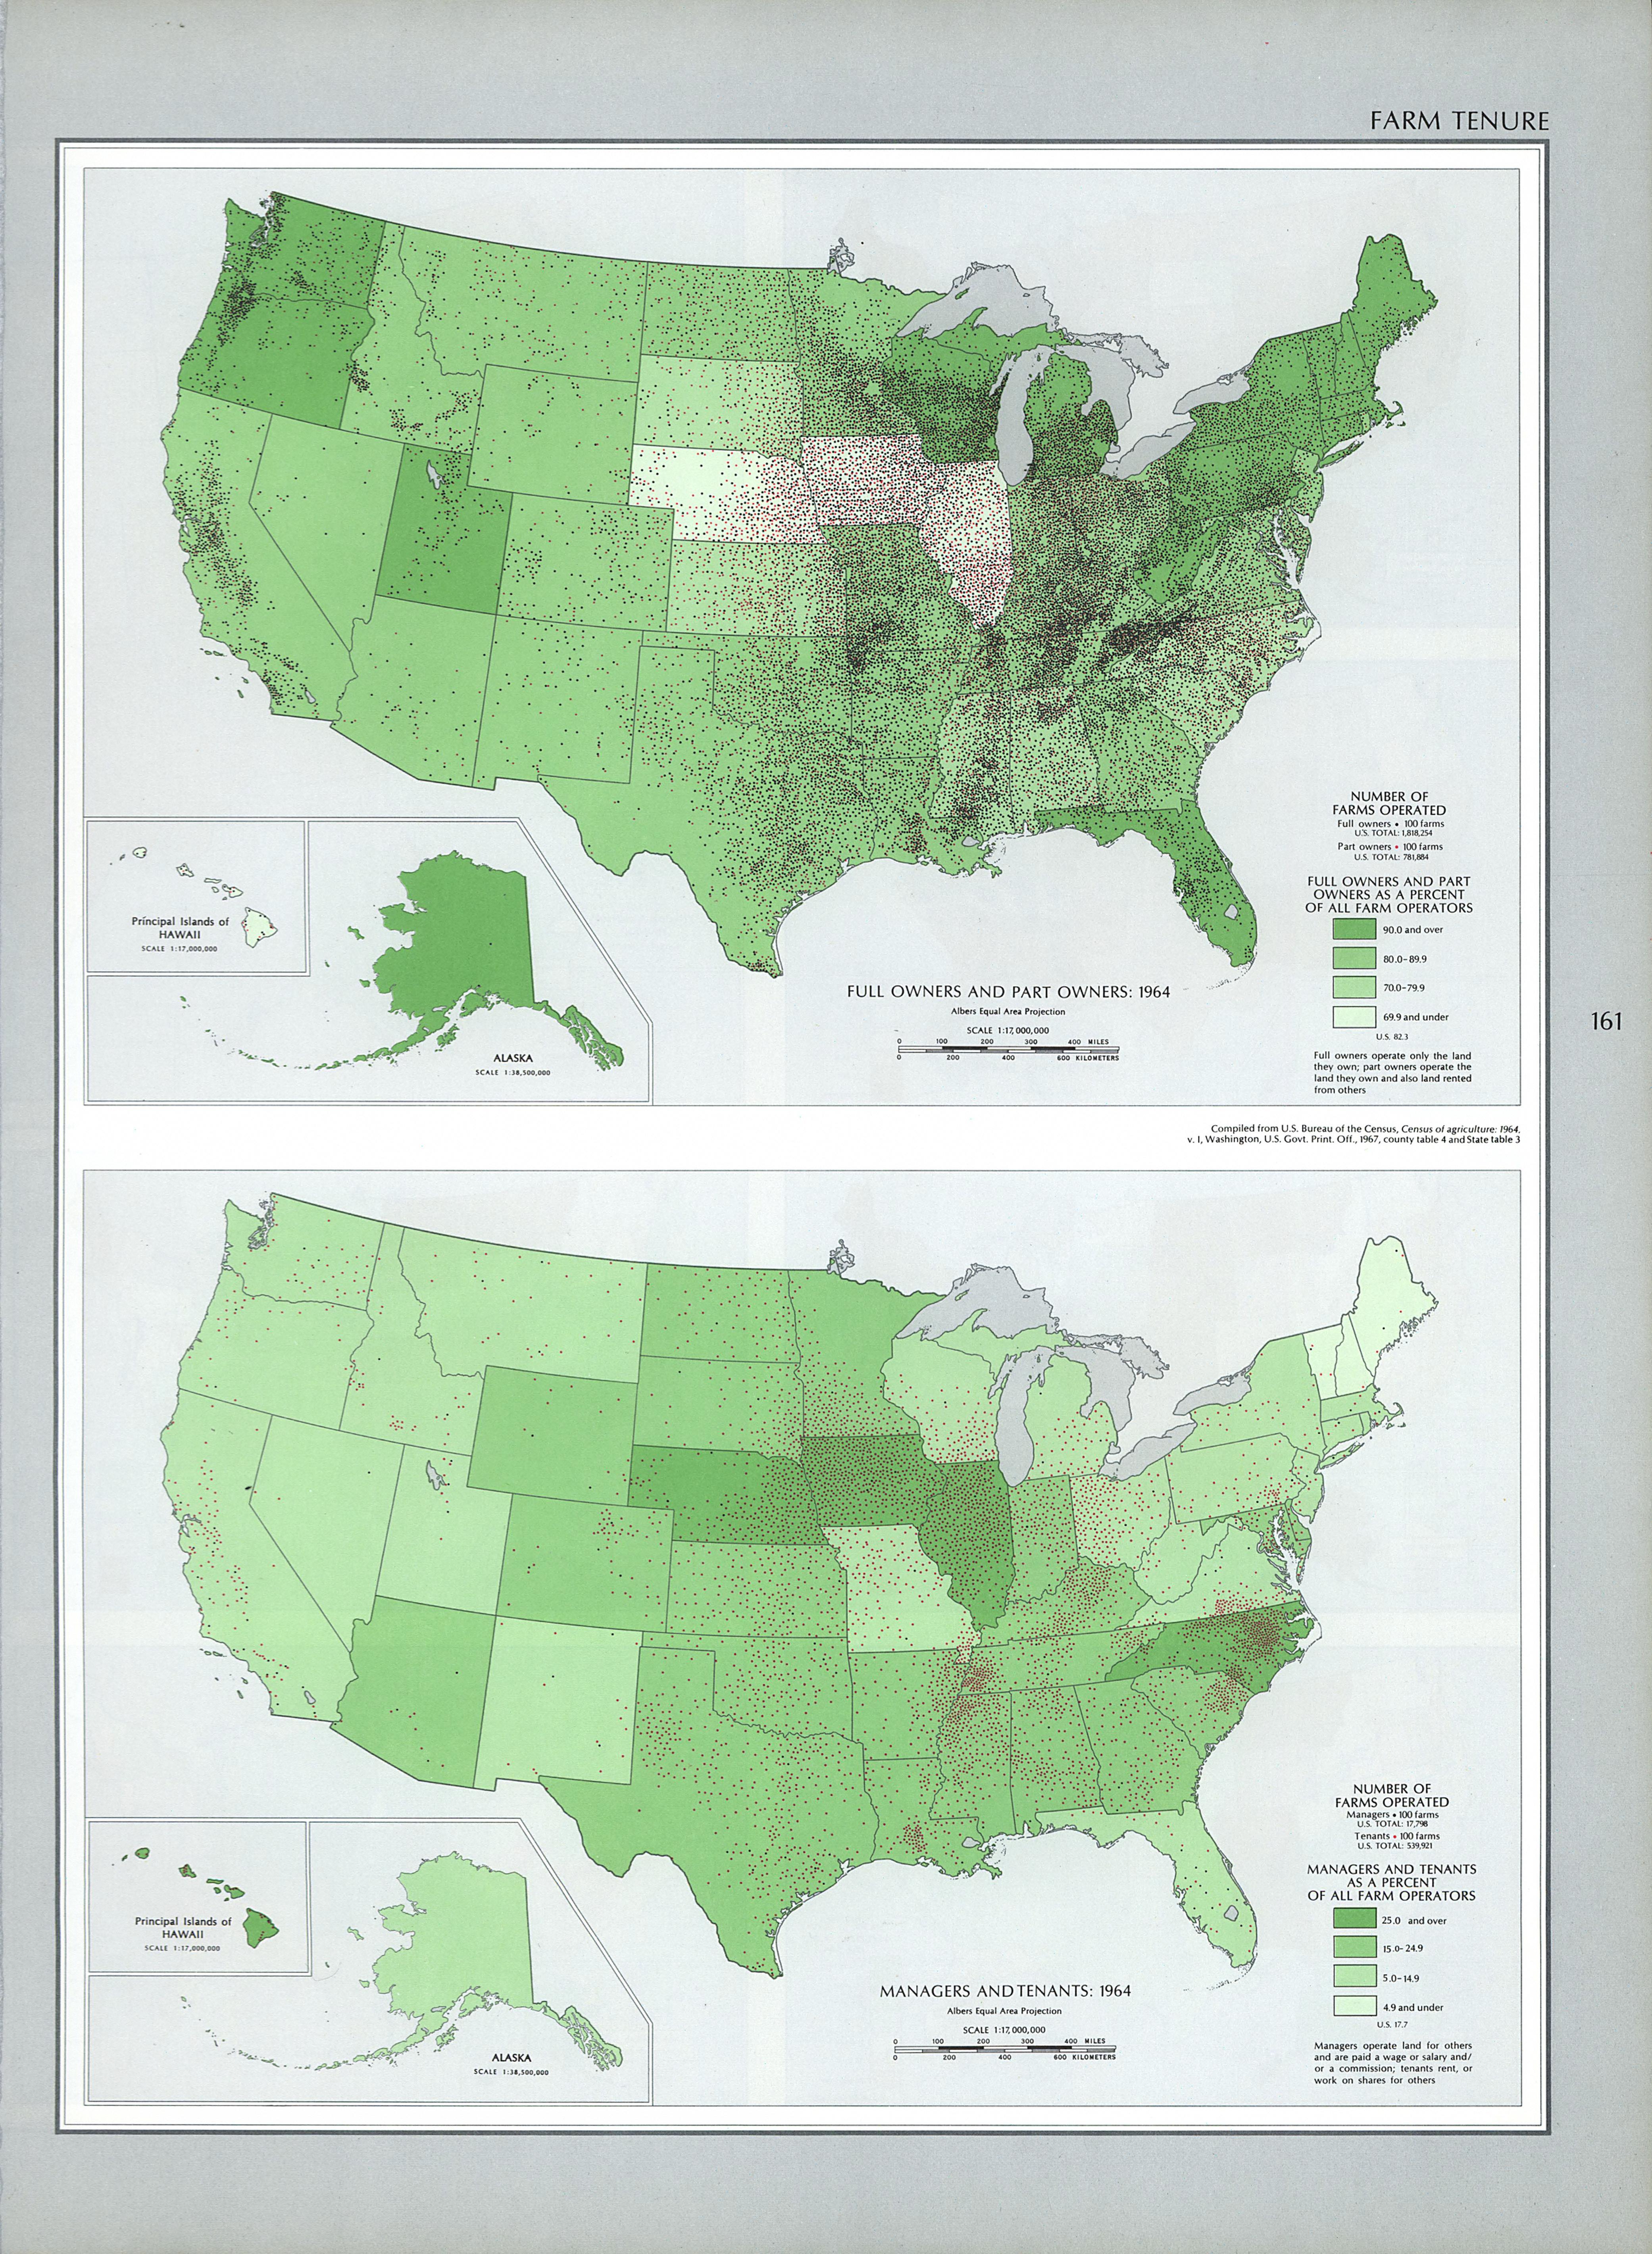 United States Farm Tenure Map